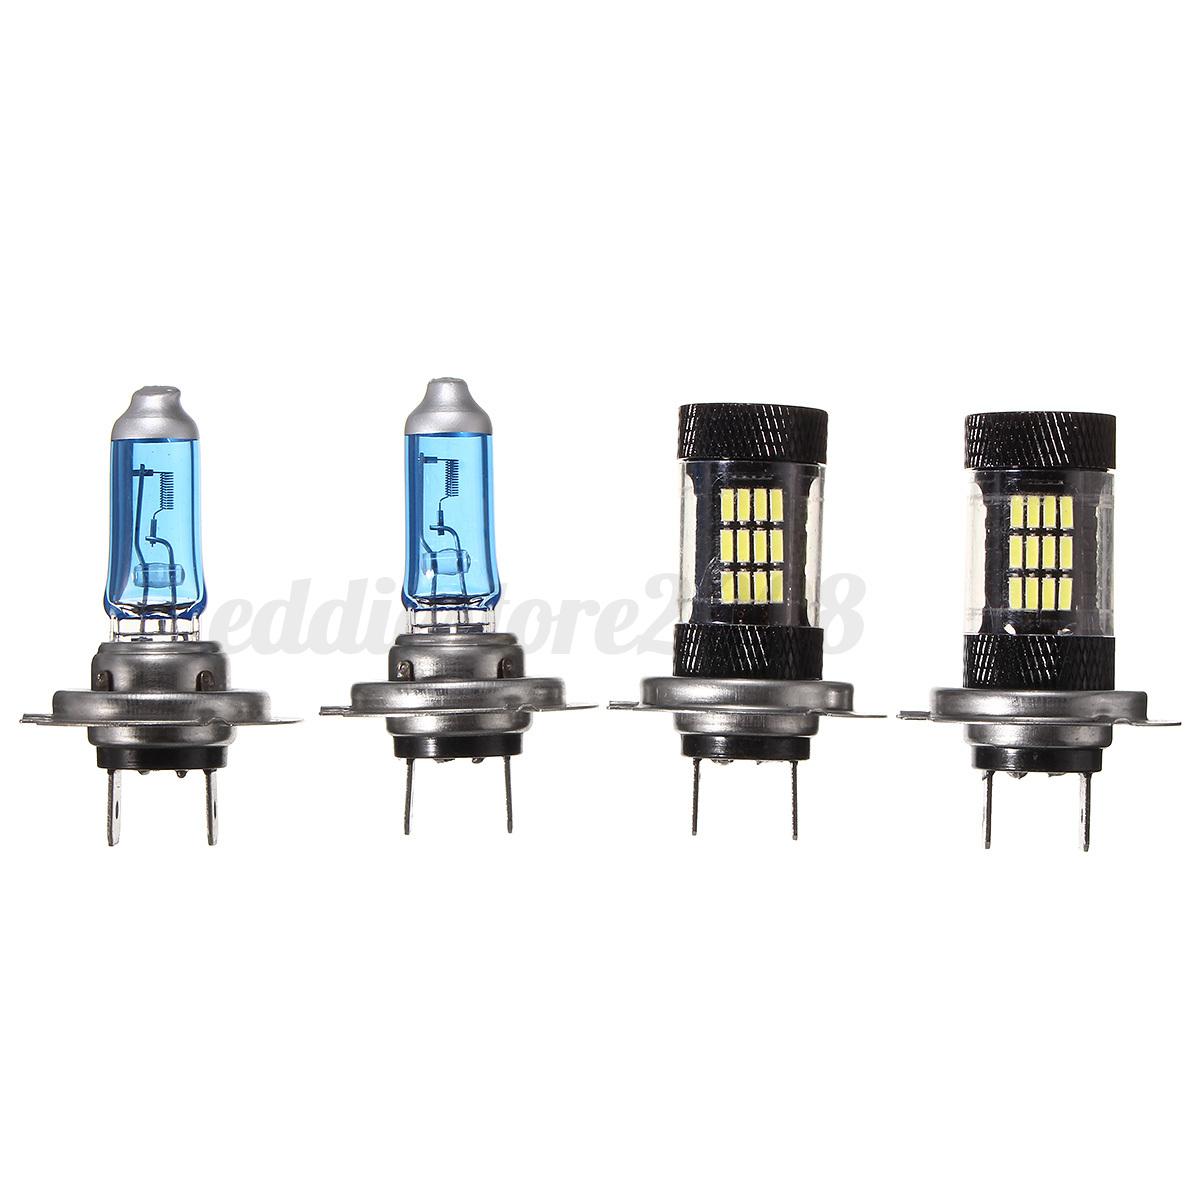 Bmw Halo Light Bulbs